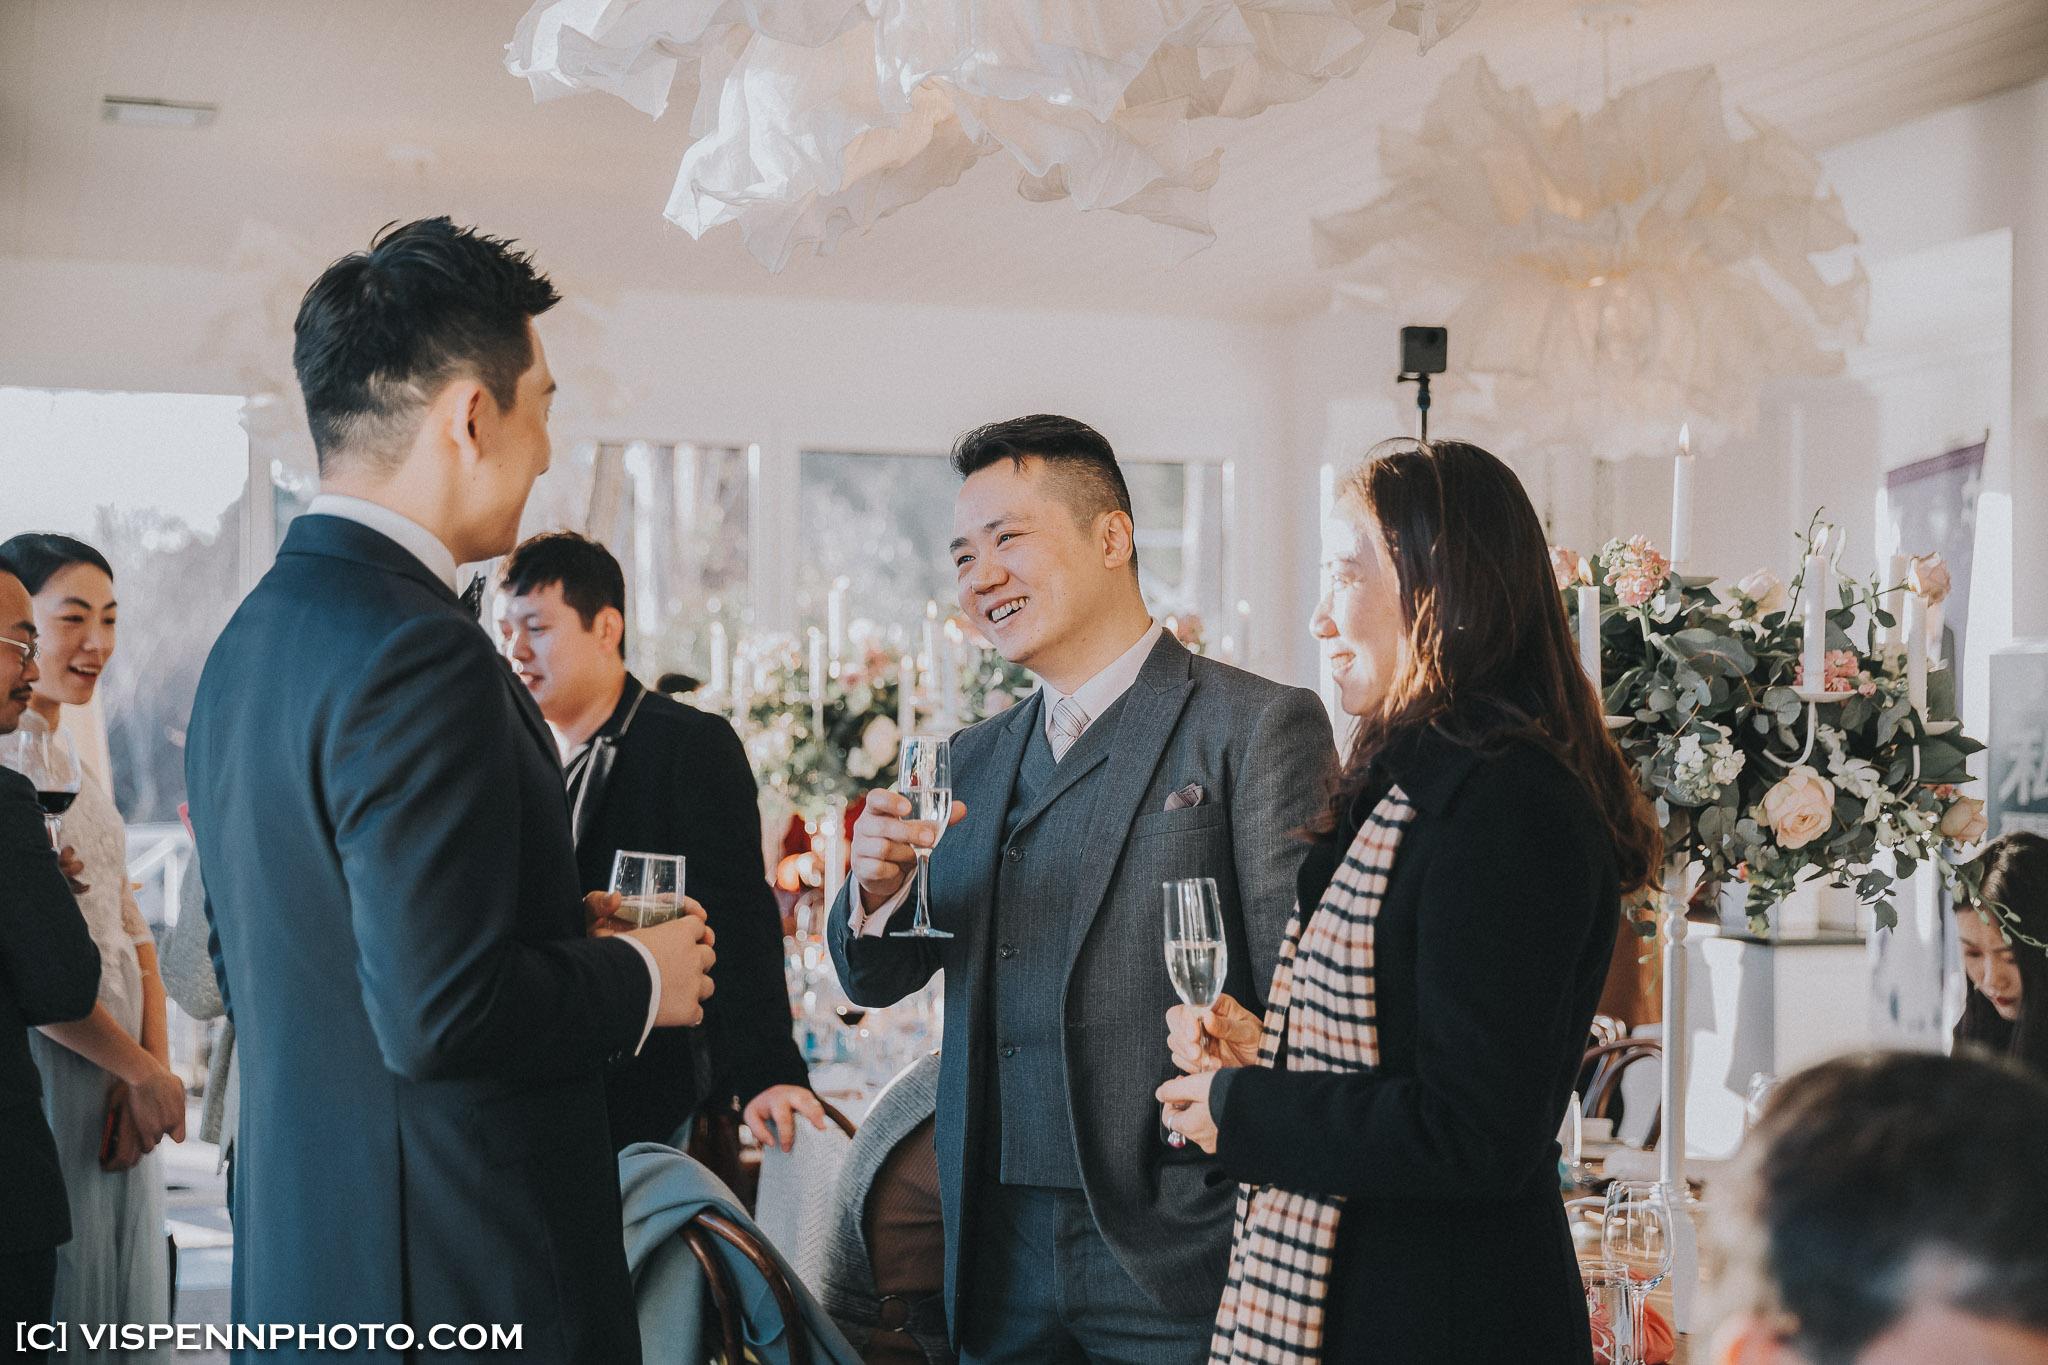 WEDDING DAY Photography Melbourne ZHPENN 1DX 4063